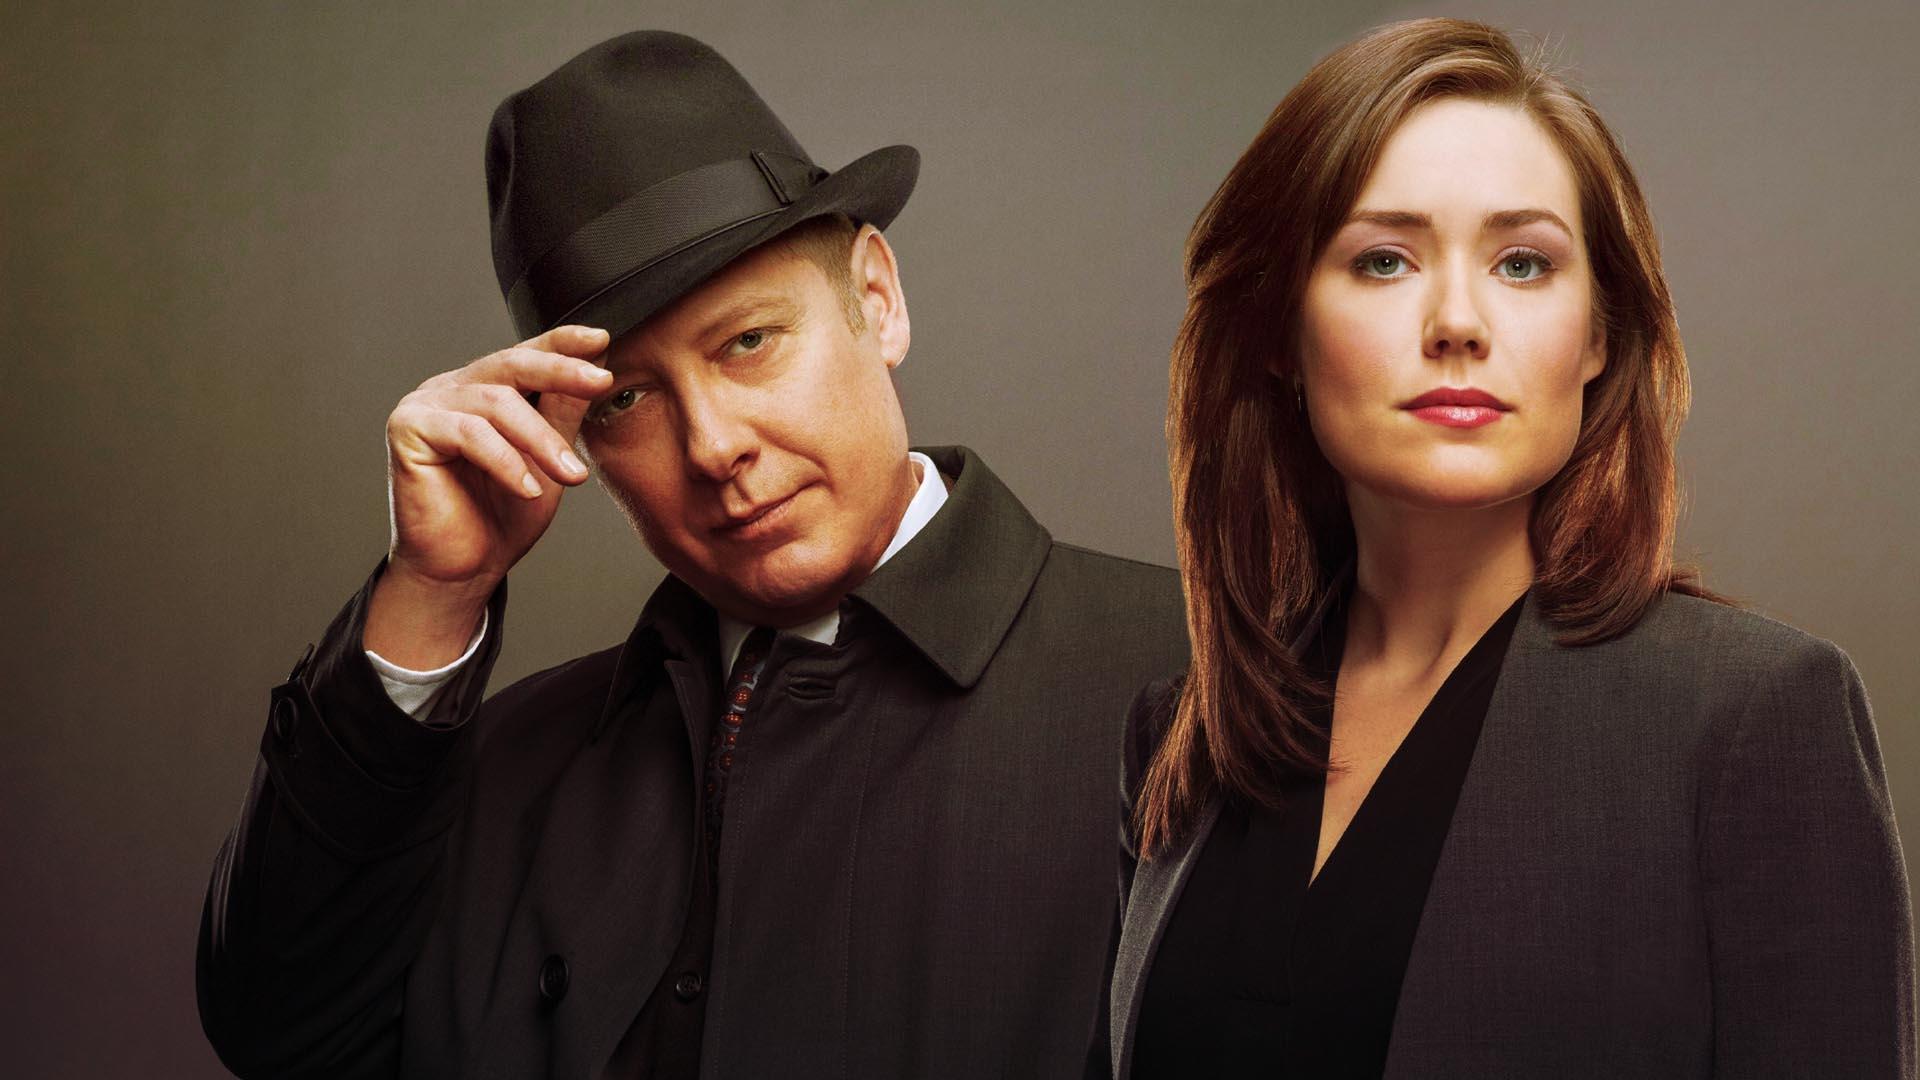 NBC-serie The Blacklist krijgt zevende seizoen